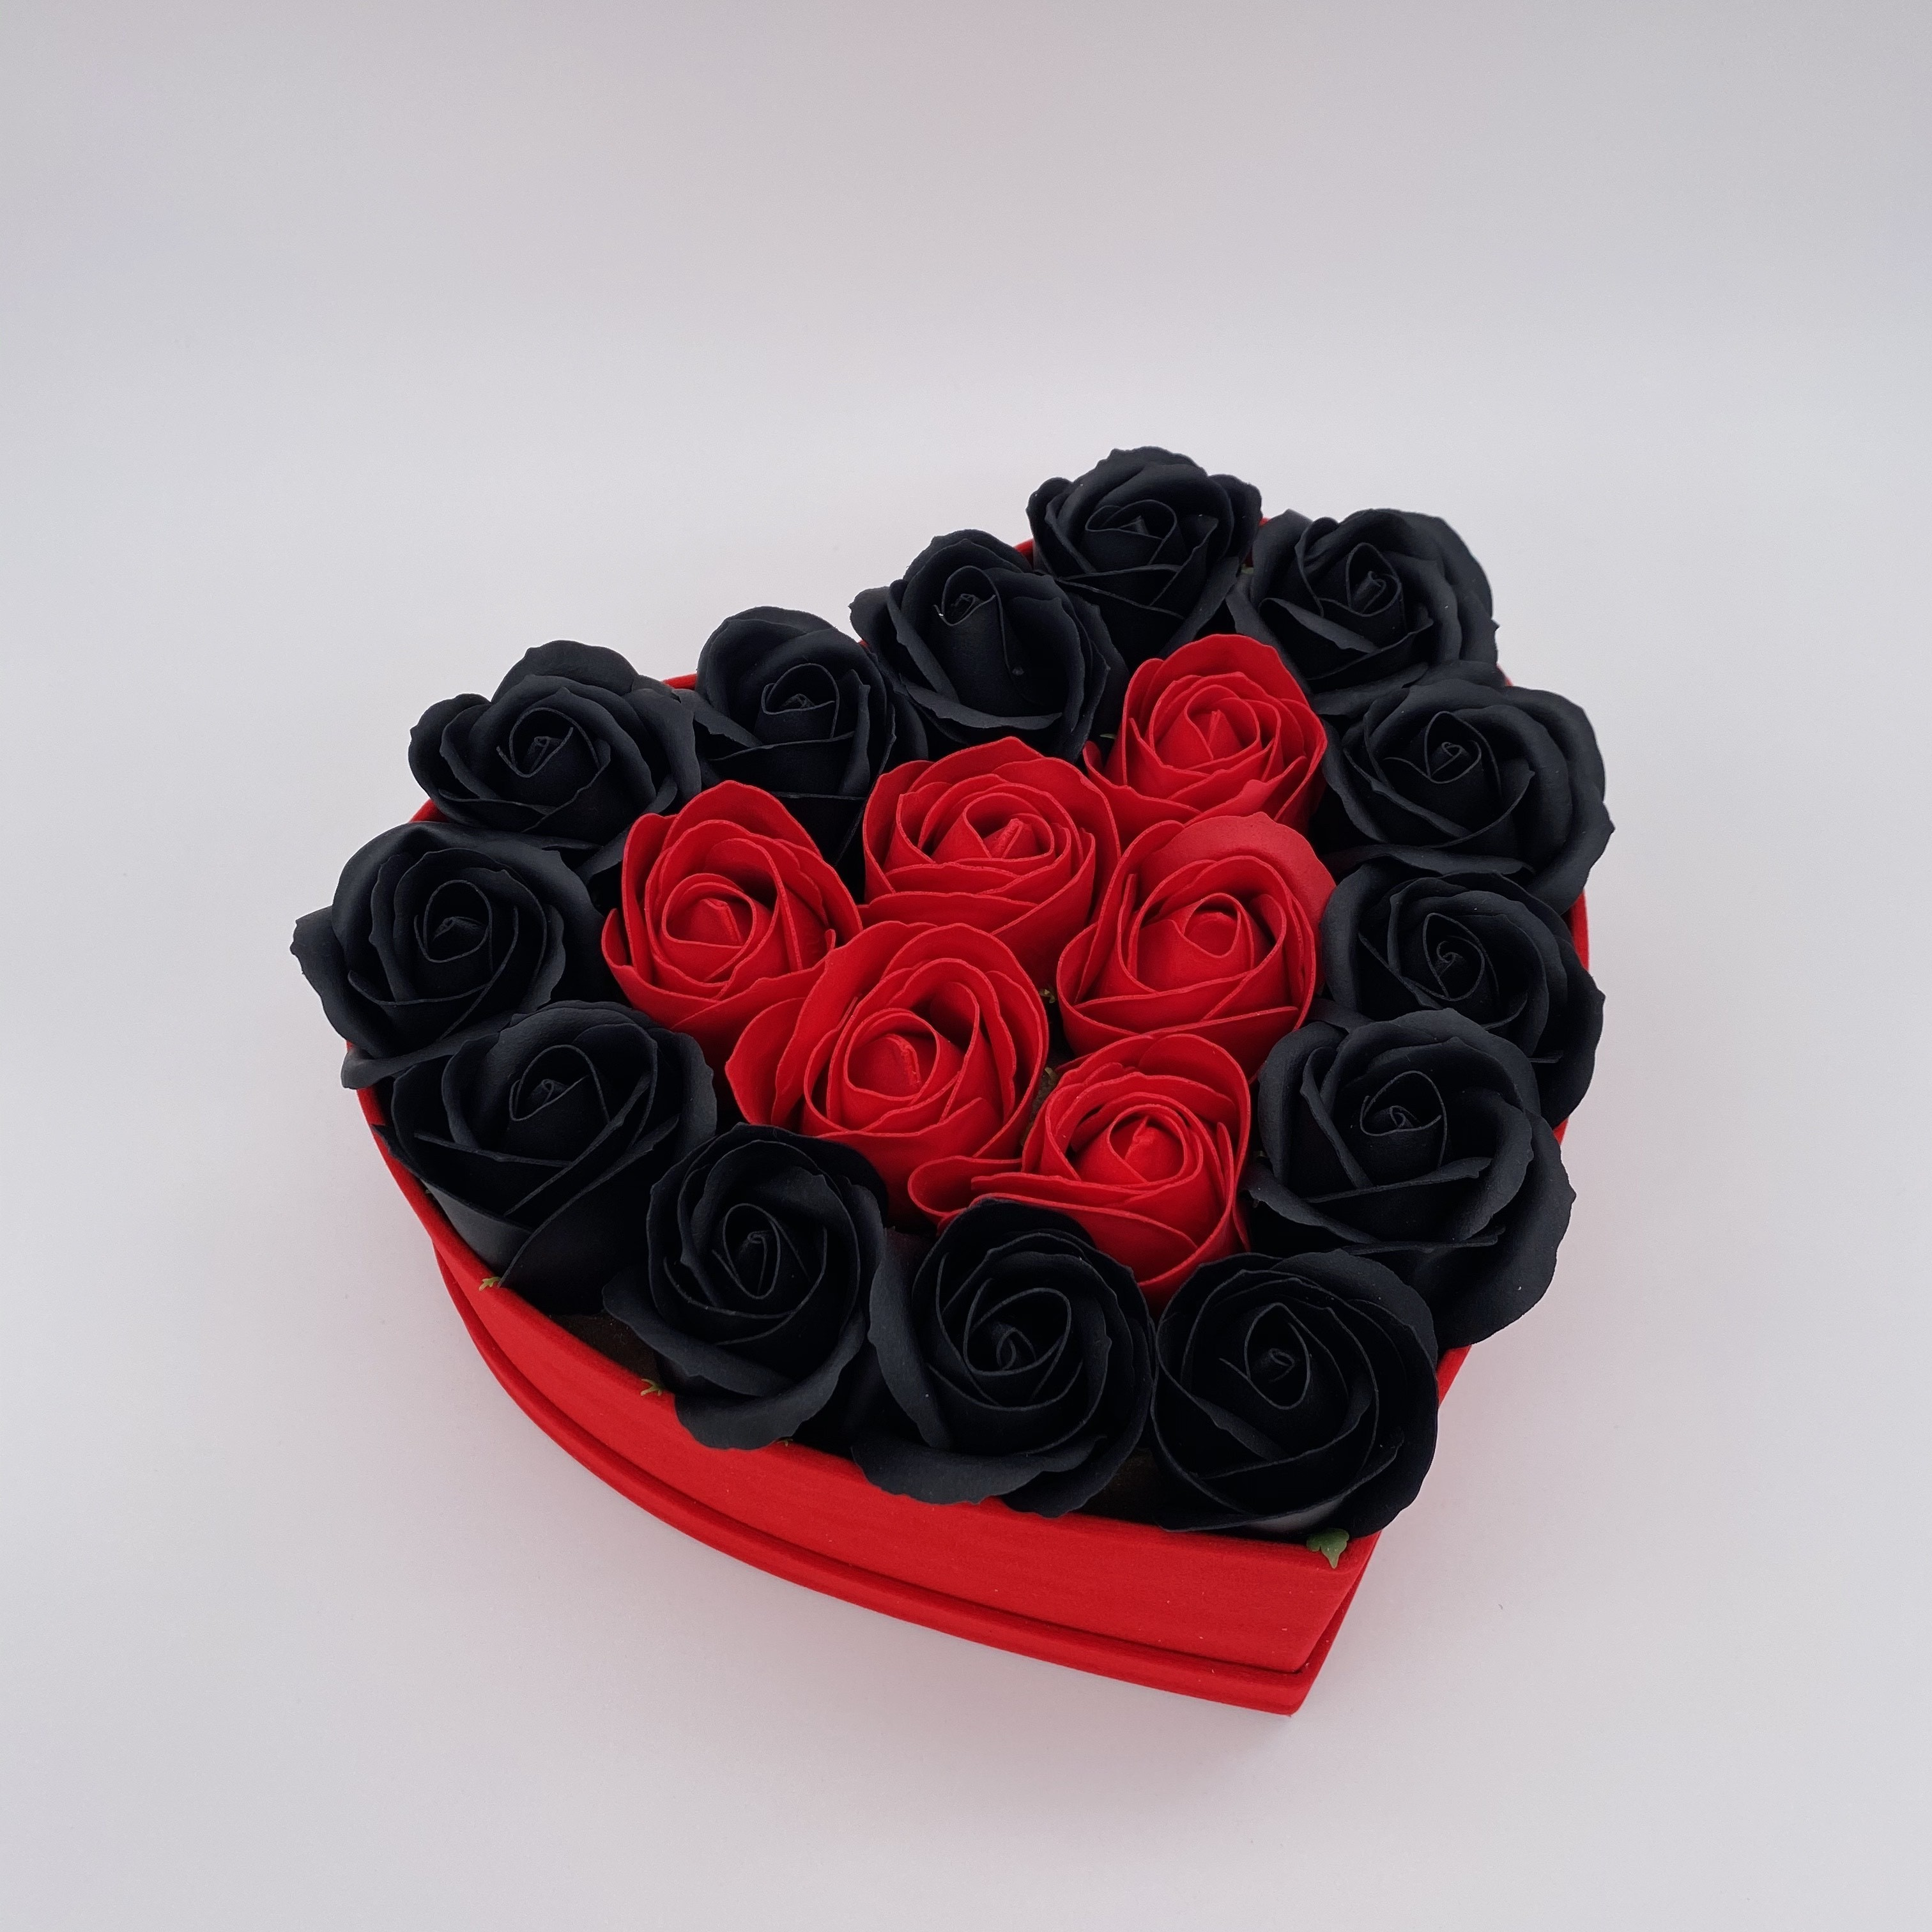 Aranjament Floral in forma de Inima, 19 Trandafiri Rosii/Negri, Cutie Rosie de Catifea, Mic imagine techstar.ro 2021